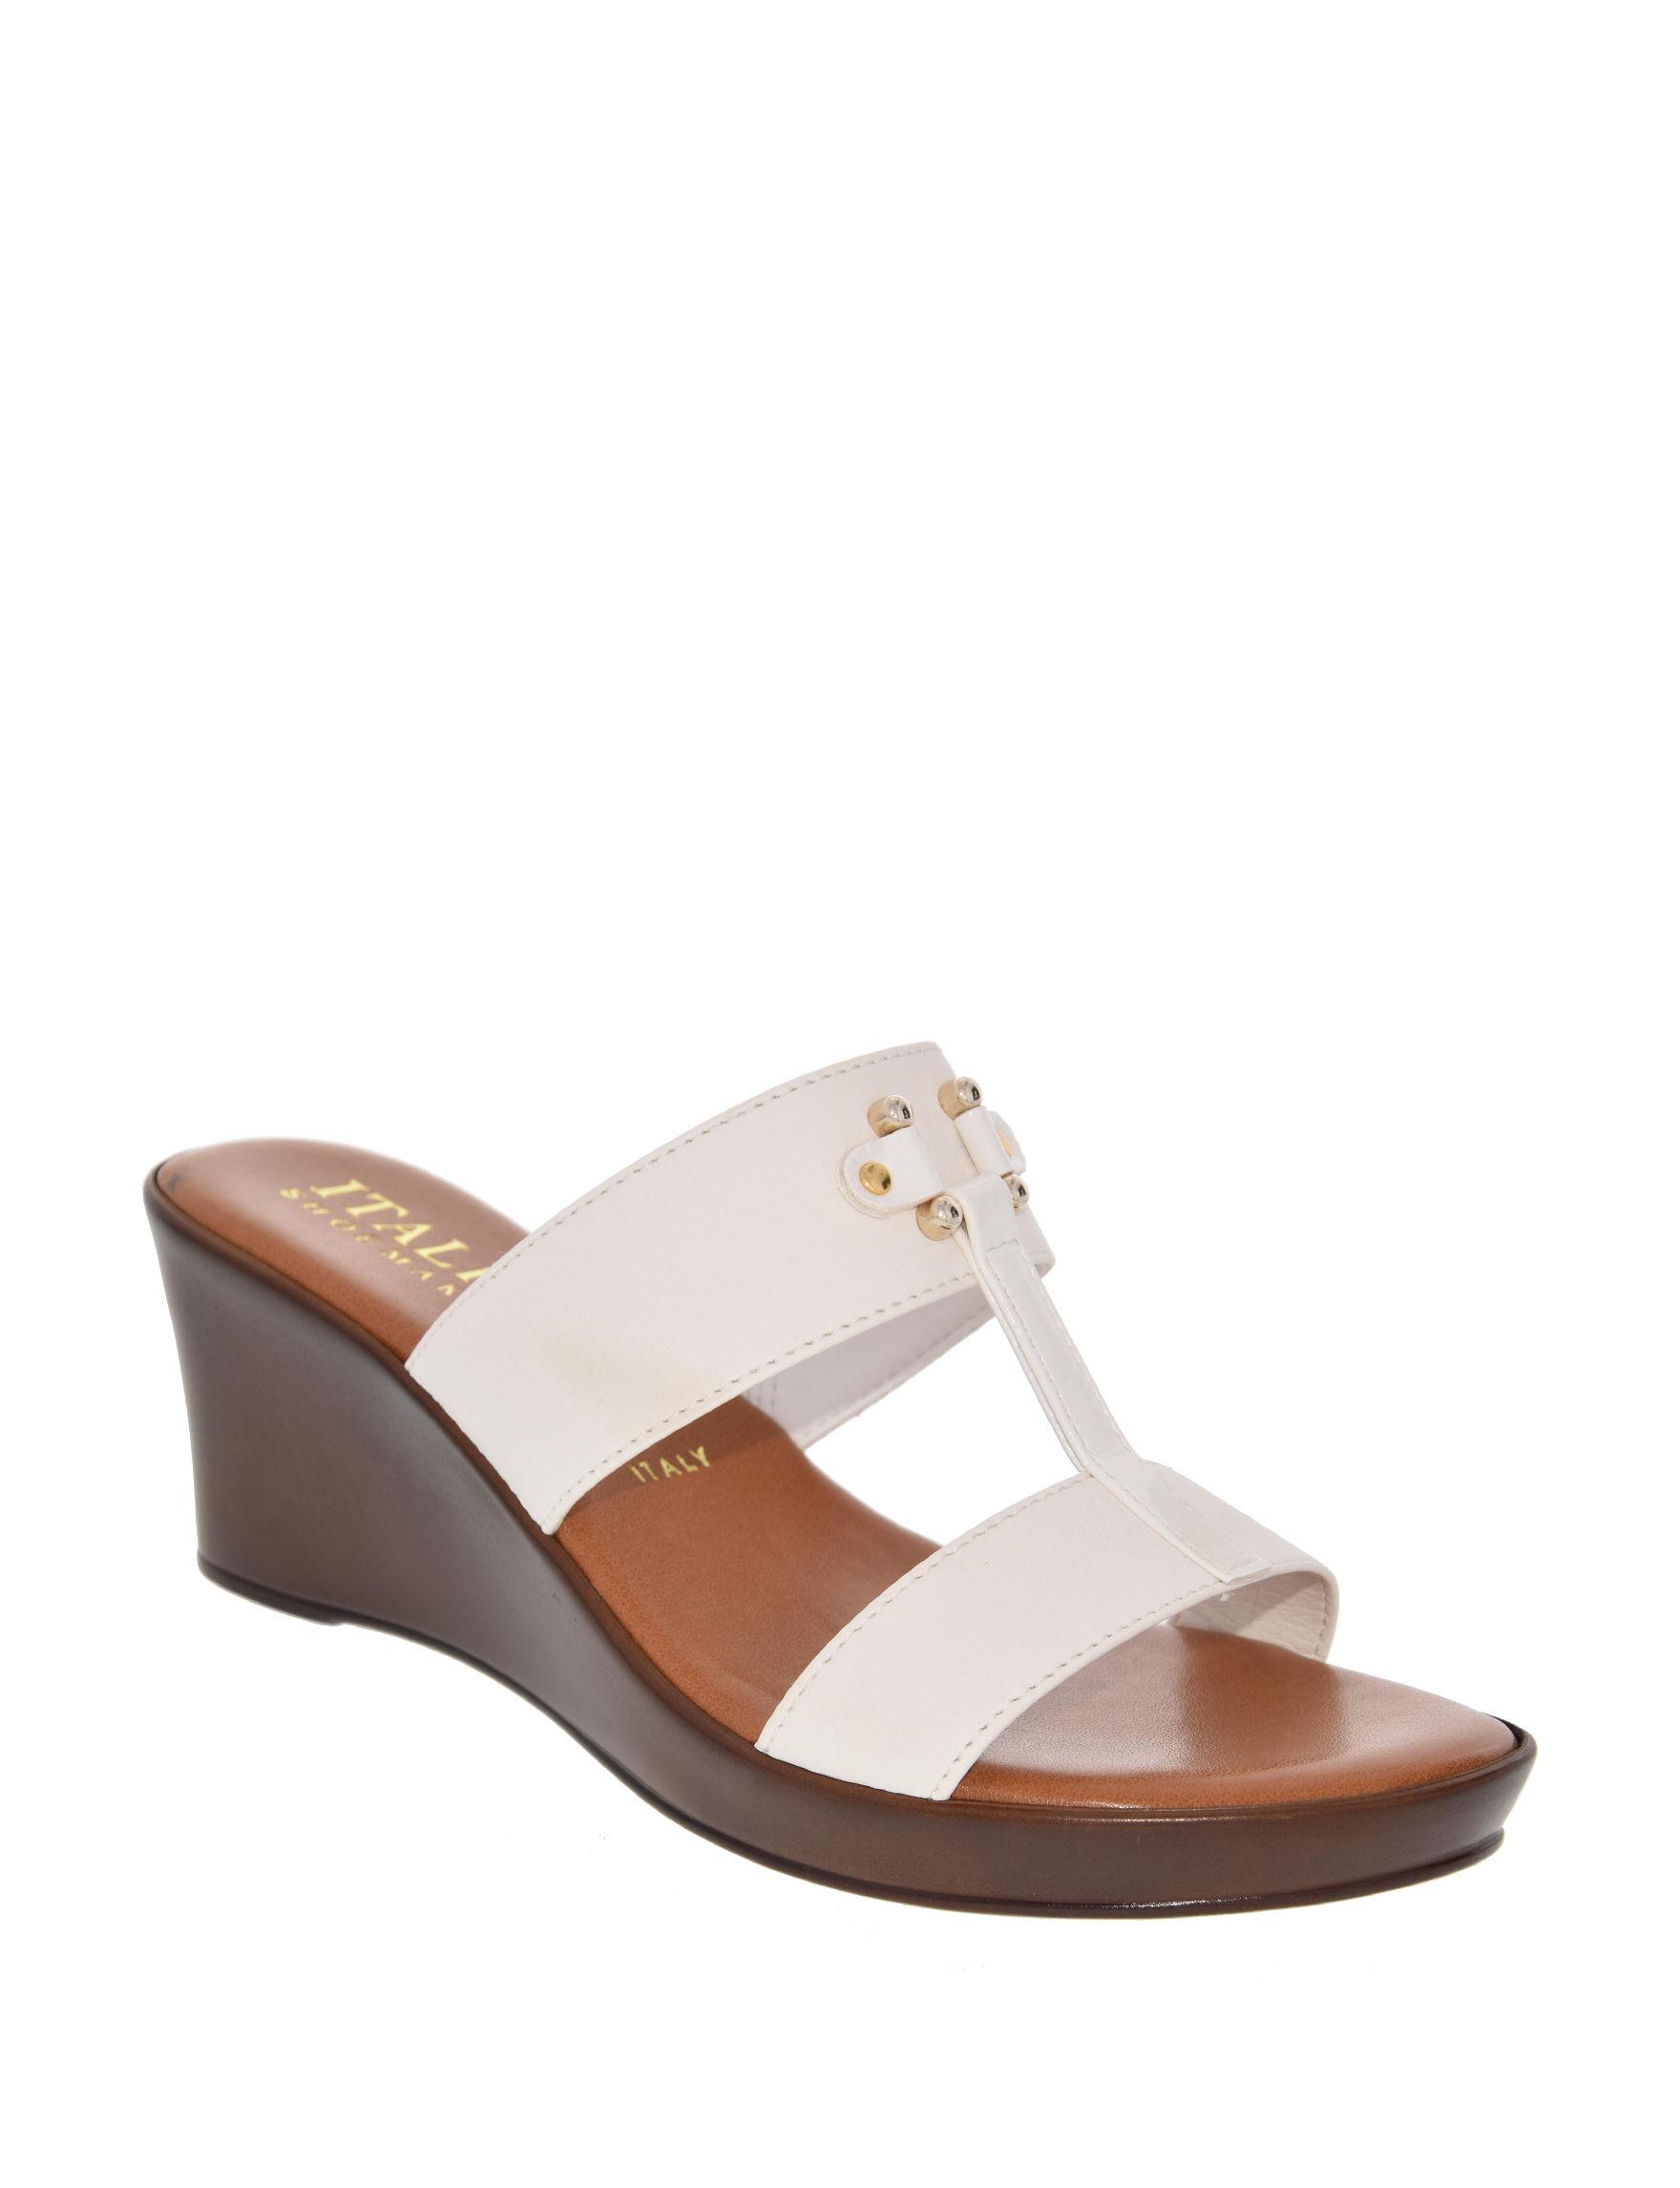 Italian Shoemakers White Wedge Sandals Comfort